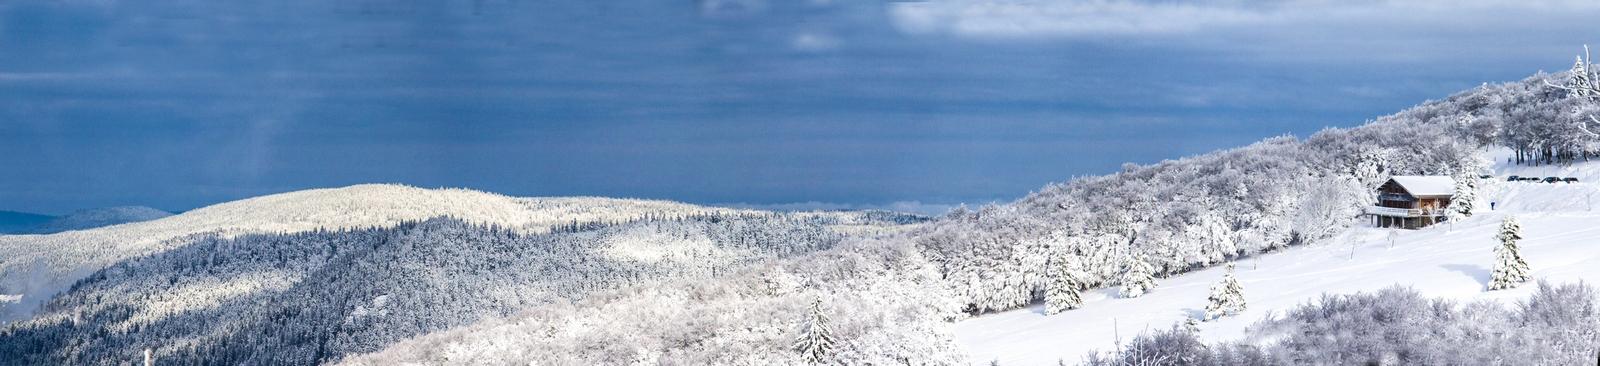 Samedi 12 novembre 2016. Le Hohneck (Hautes Vosges)